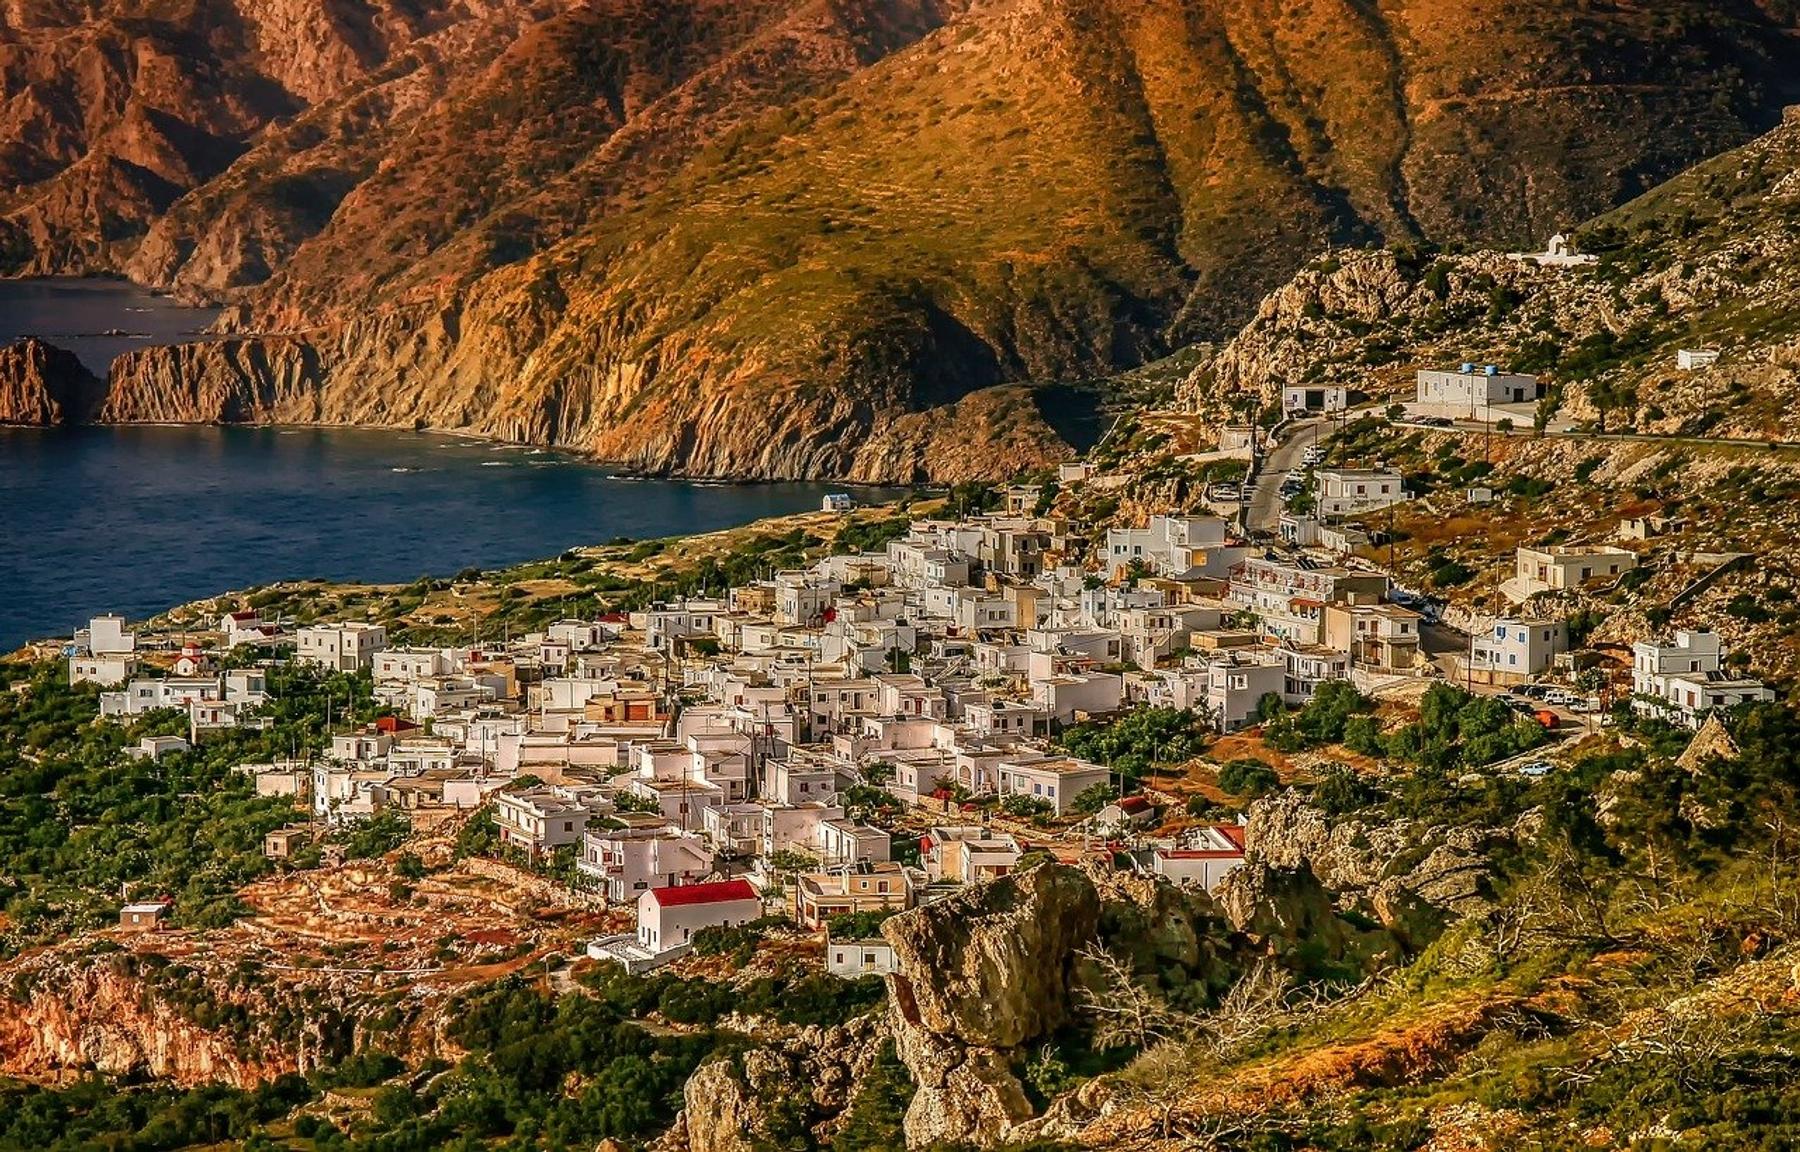 Griechenland-Geheimtipp: Karpathos